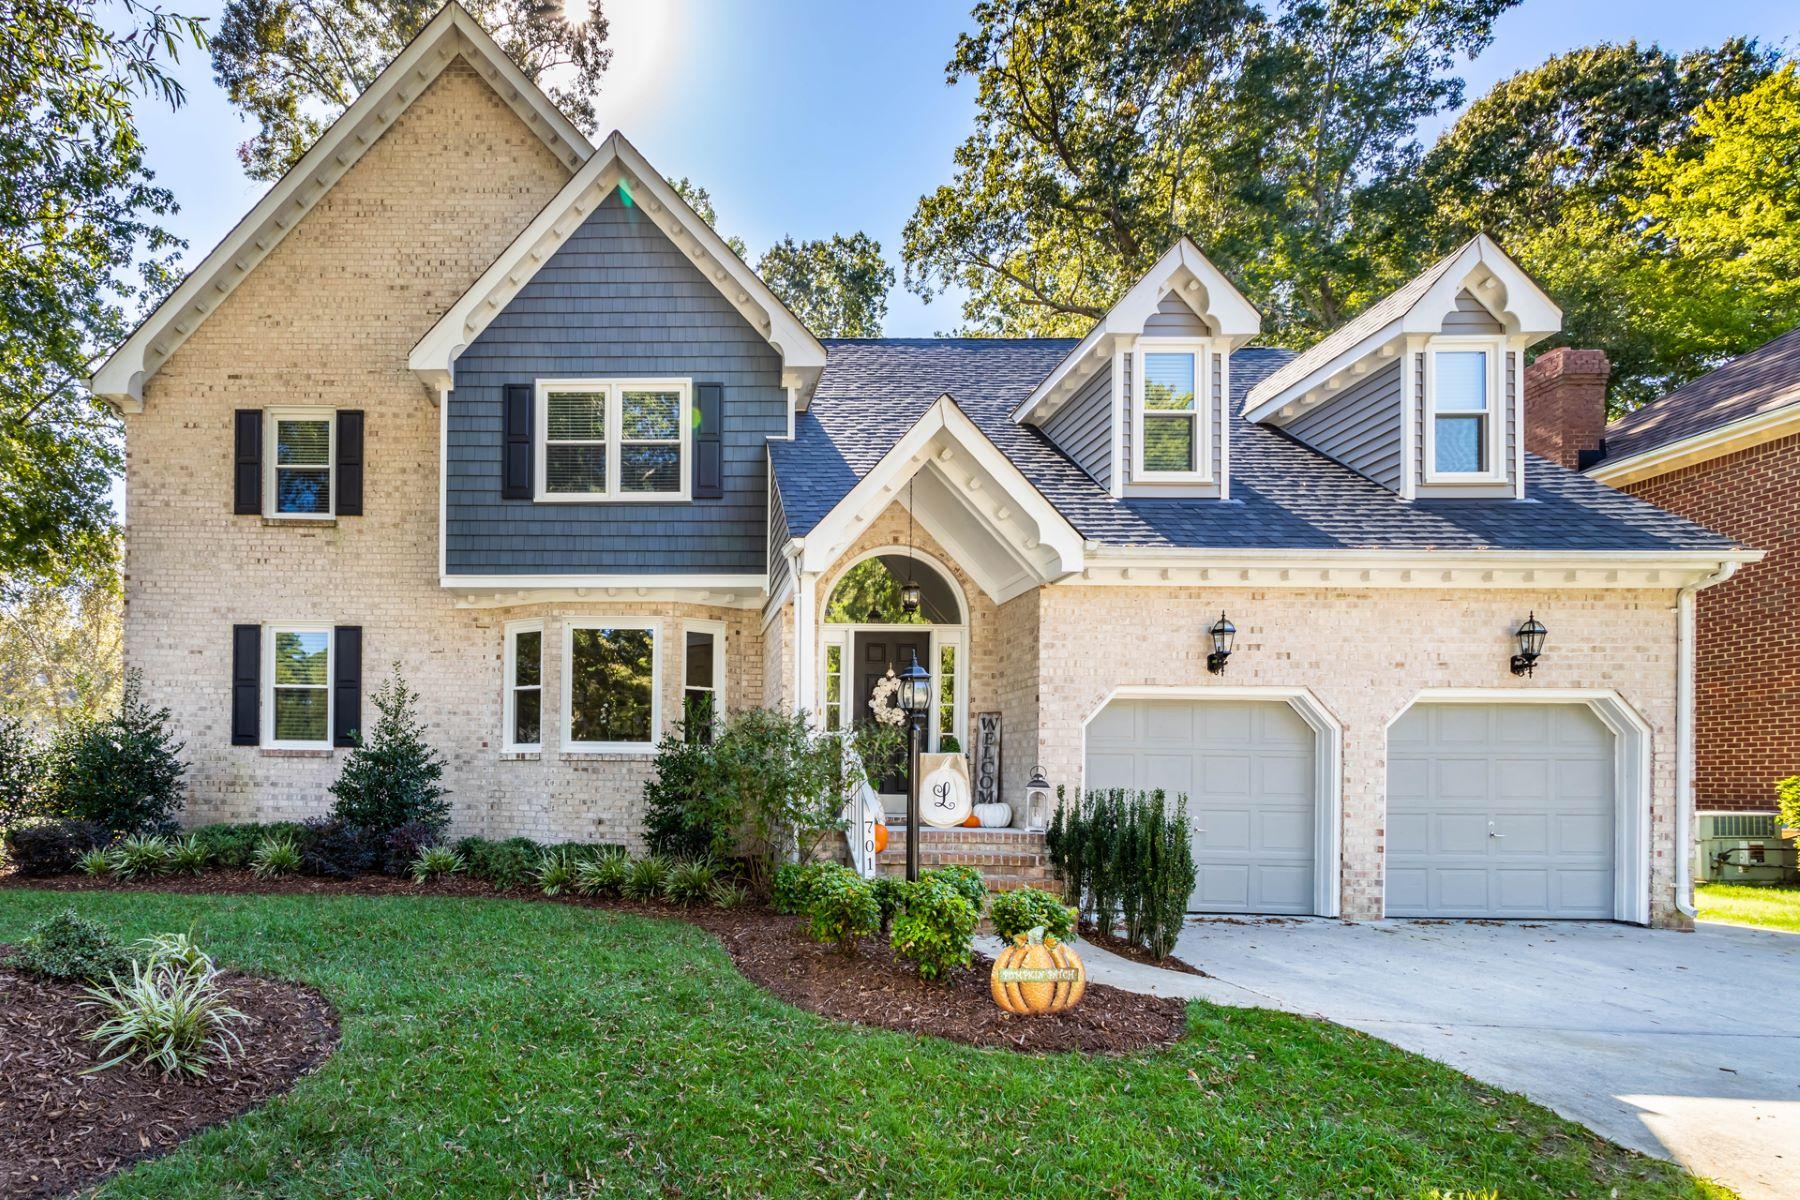 Single Family Homes pour l Vente à Riverwalk 701 Spice Quay, Chesapeake, Virginia 23320 États-Unis